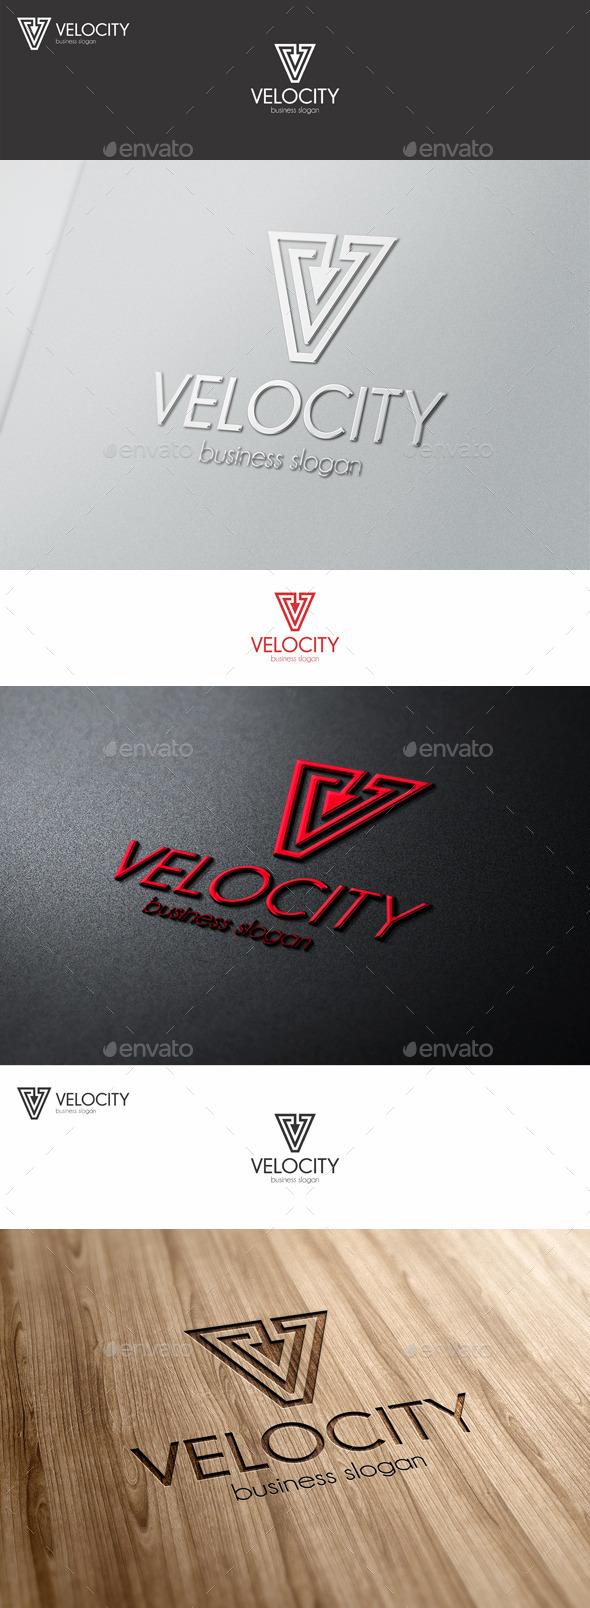 GraphicRiver Velocity Vector V Letter Logo 10417484